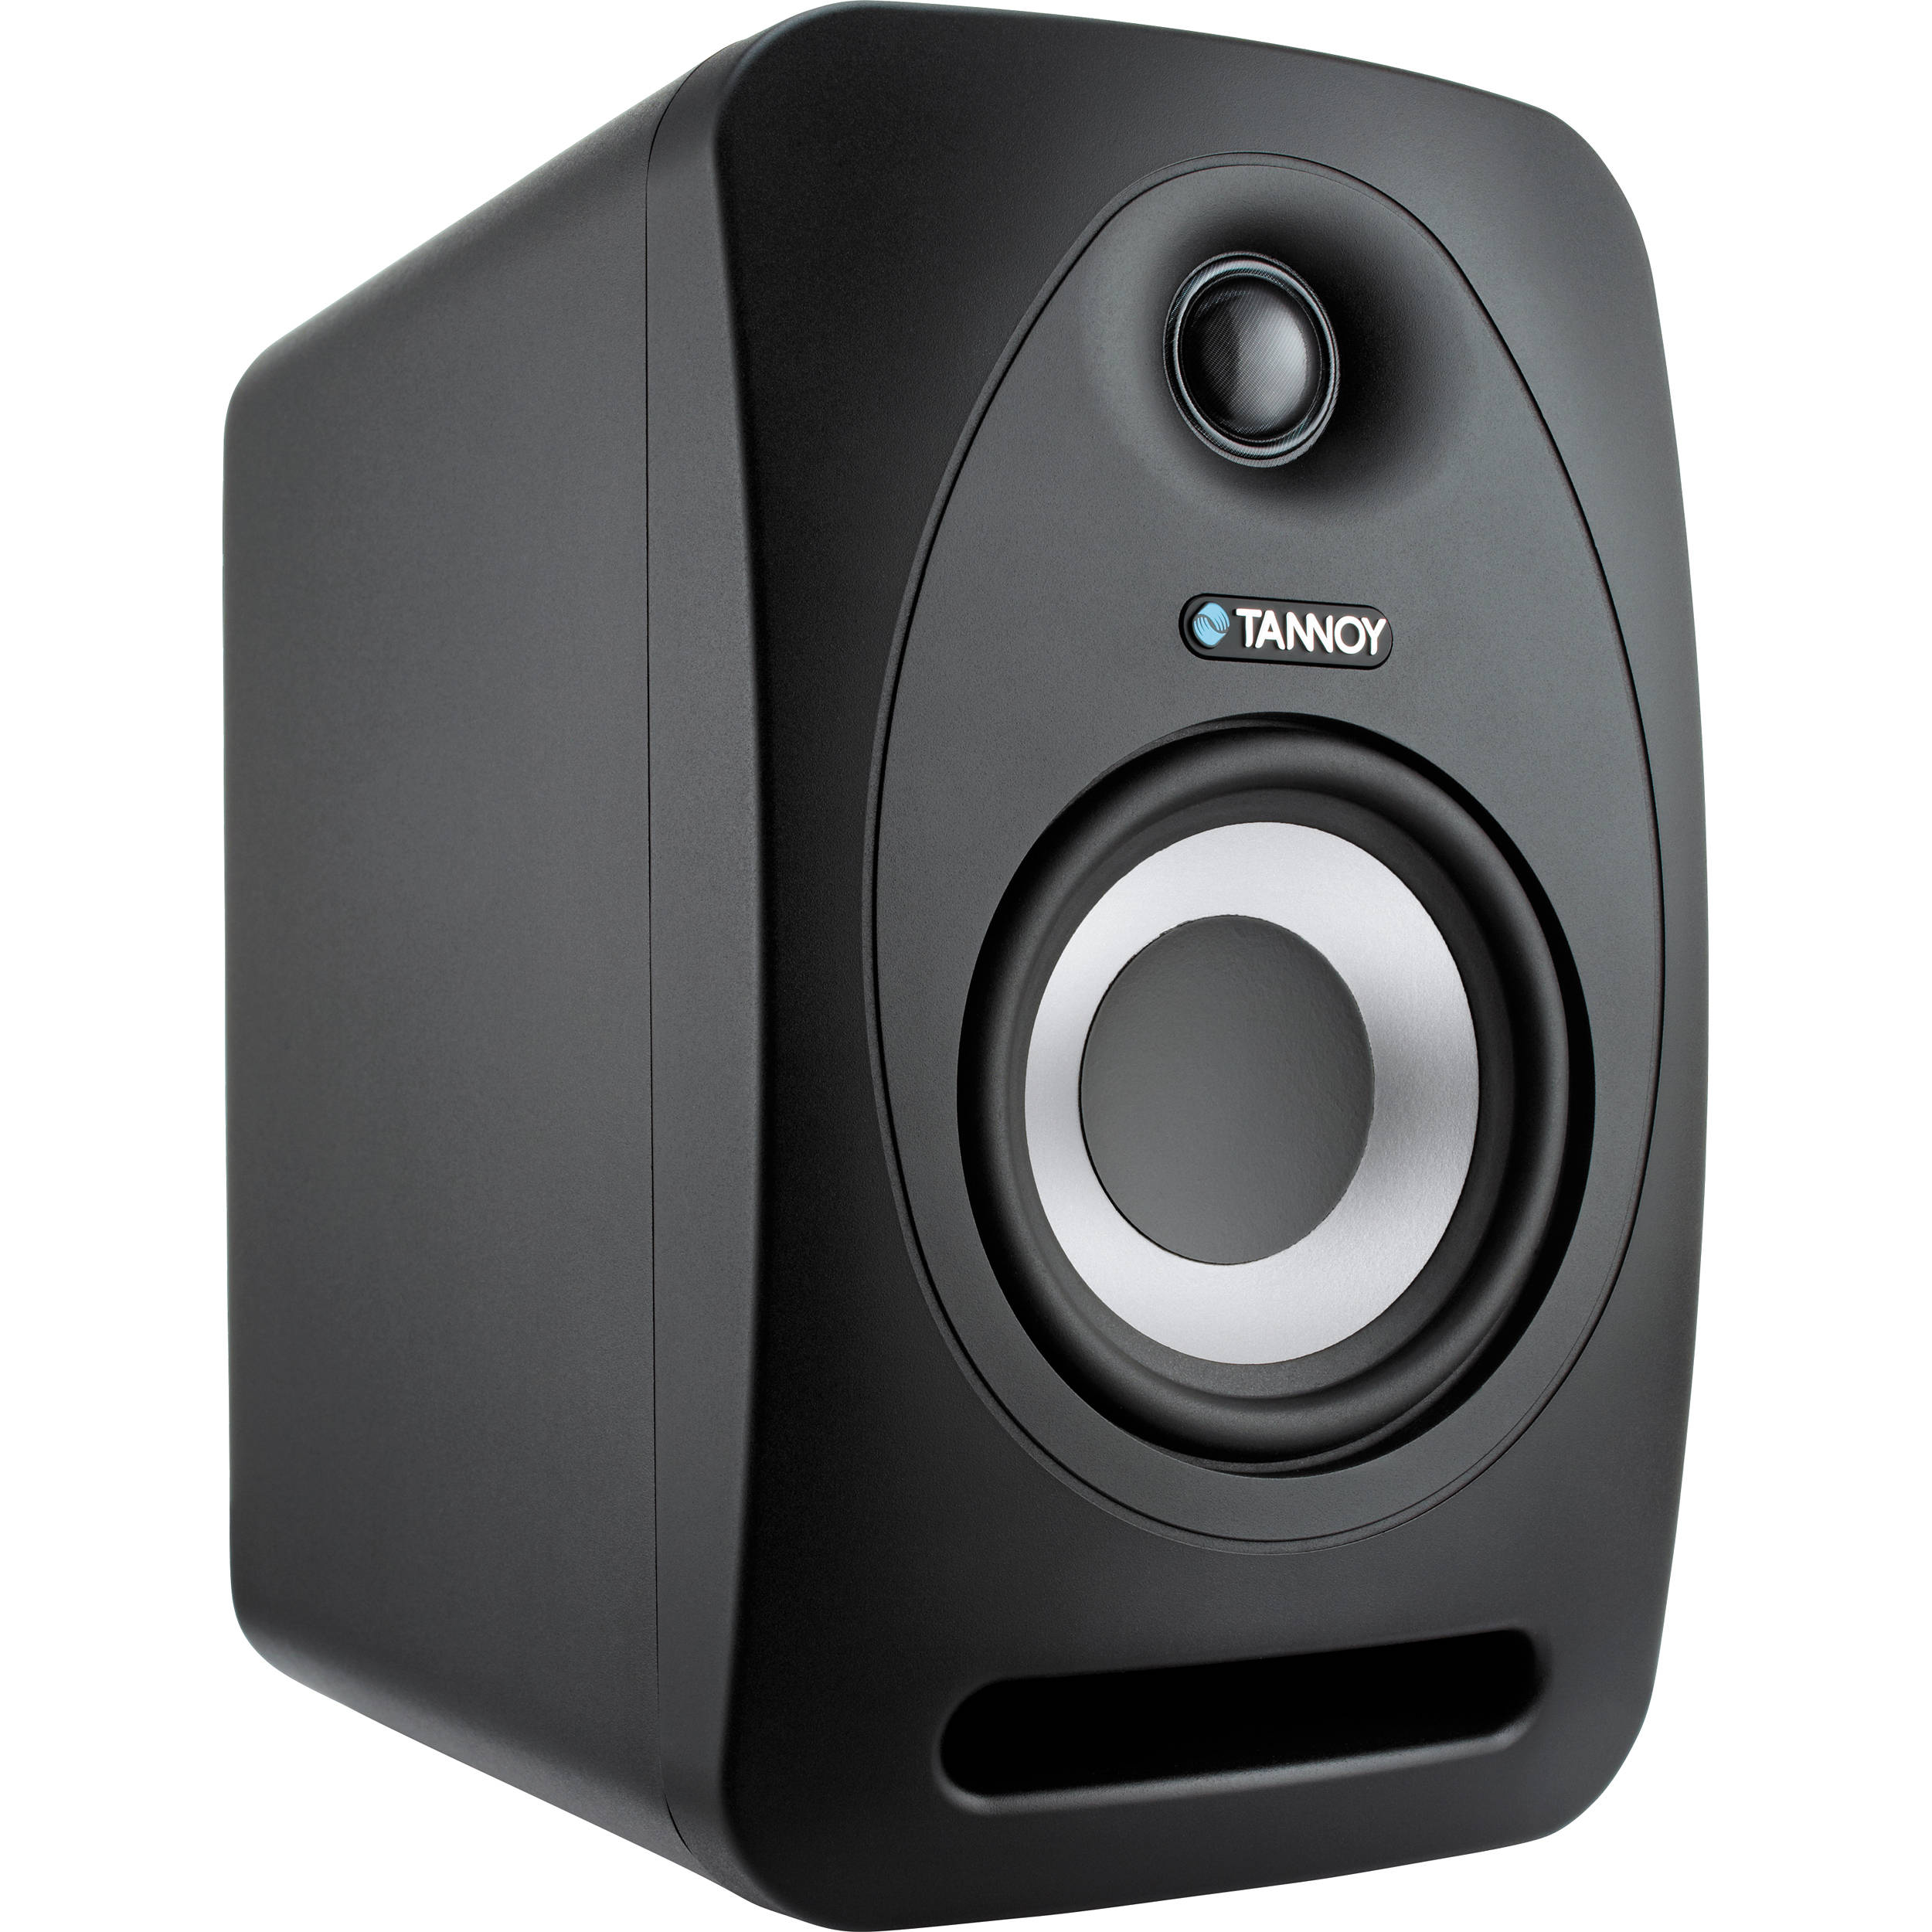 TannoyRevealWActiveStudioMonitor80017680